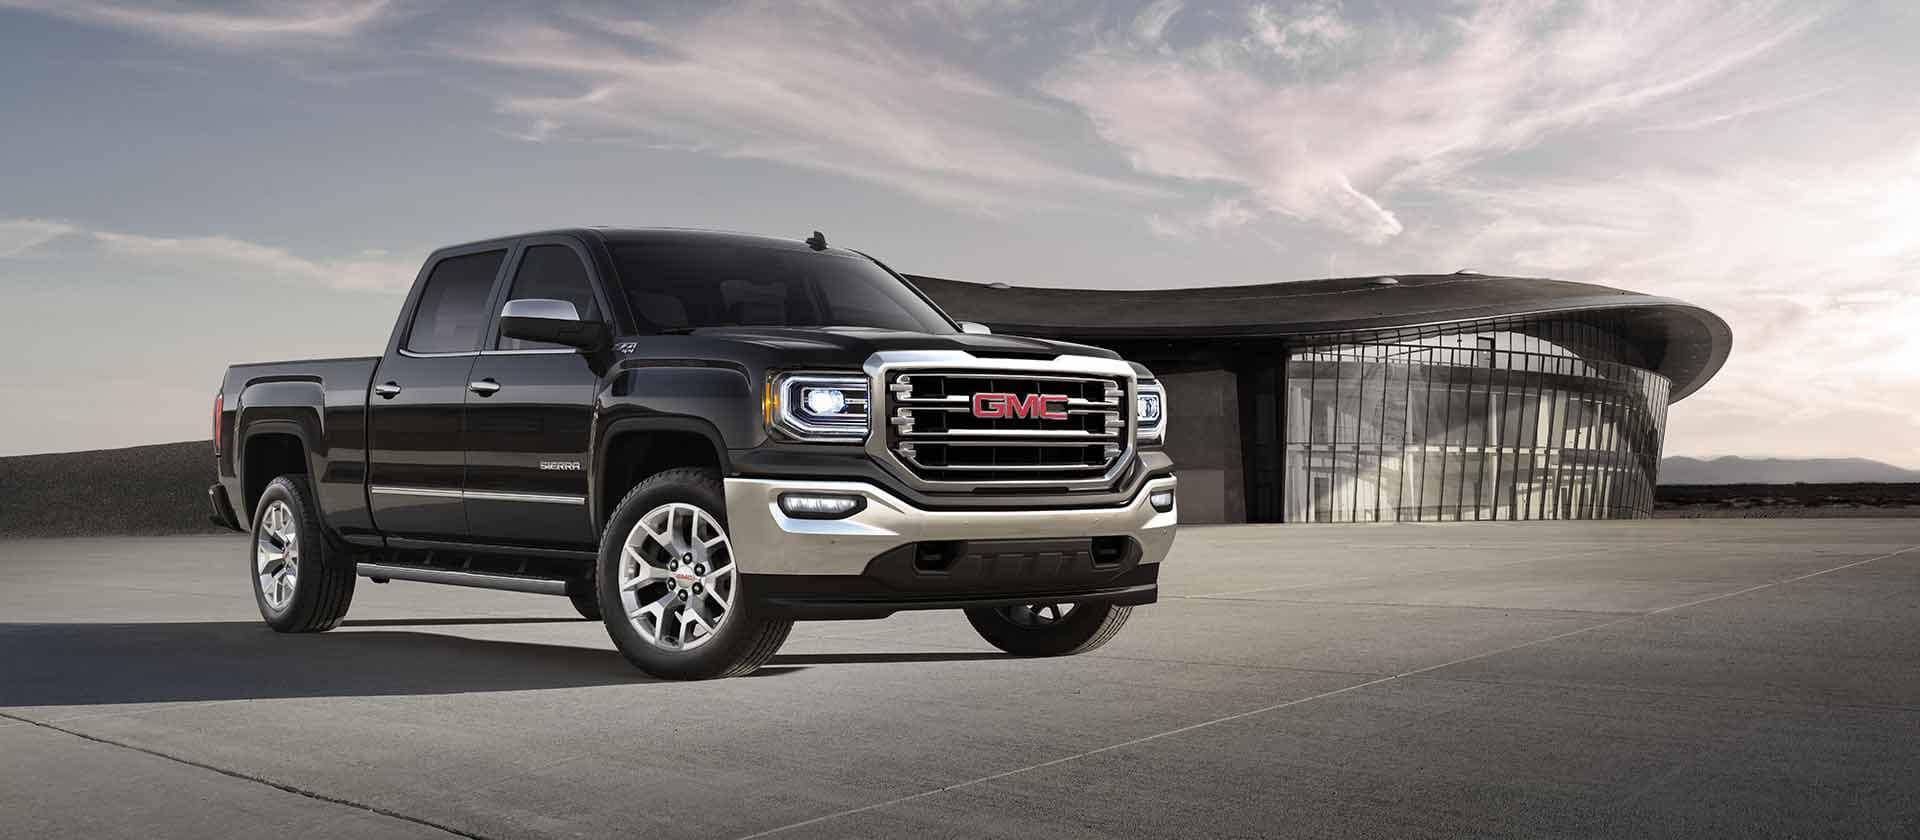 sale truck sold image trucks item for gmc sierra pickup july auction